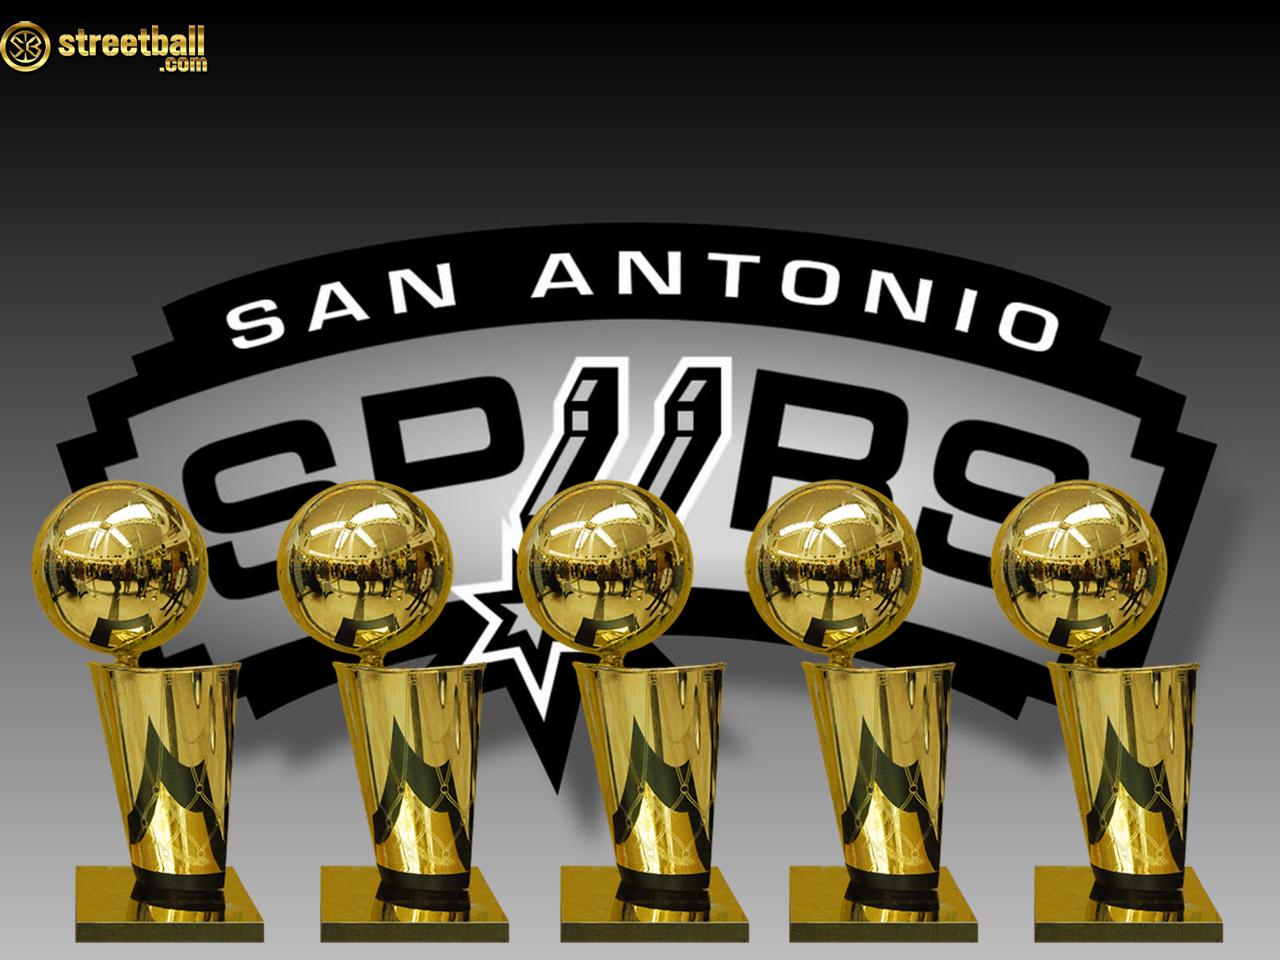 Spurs HD NBA Champions Wallpaper Streetball San